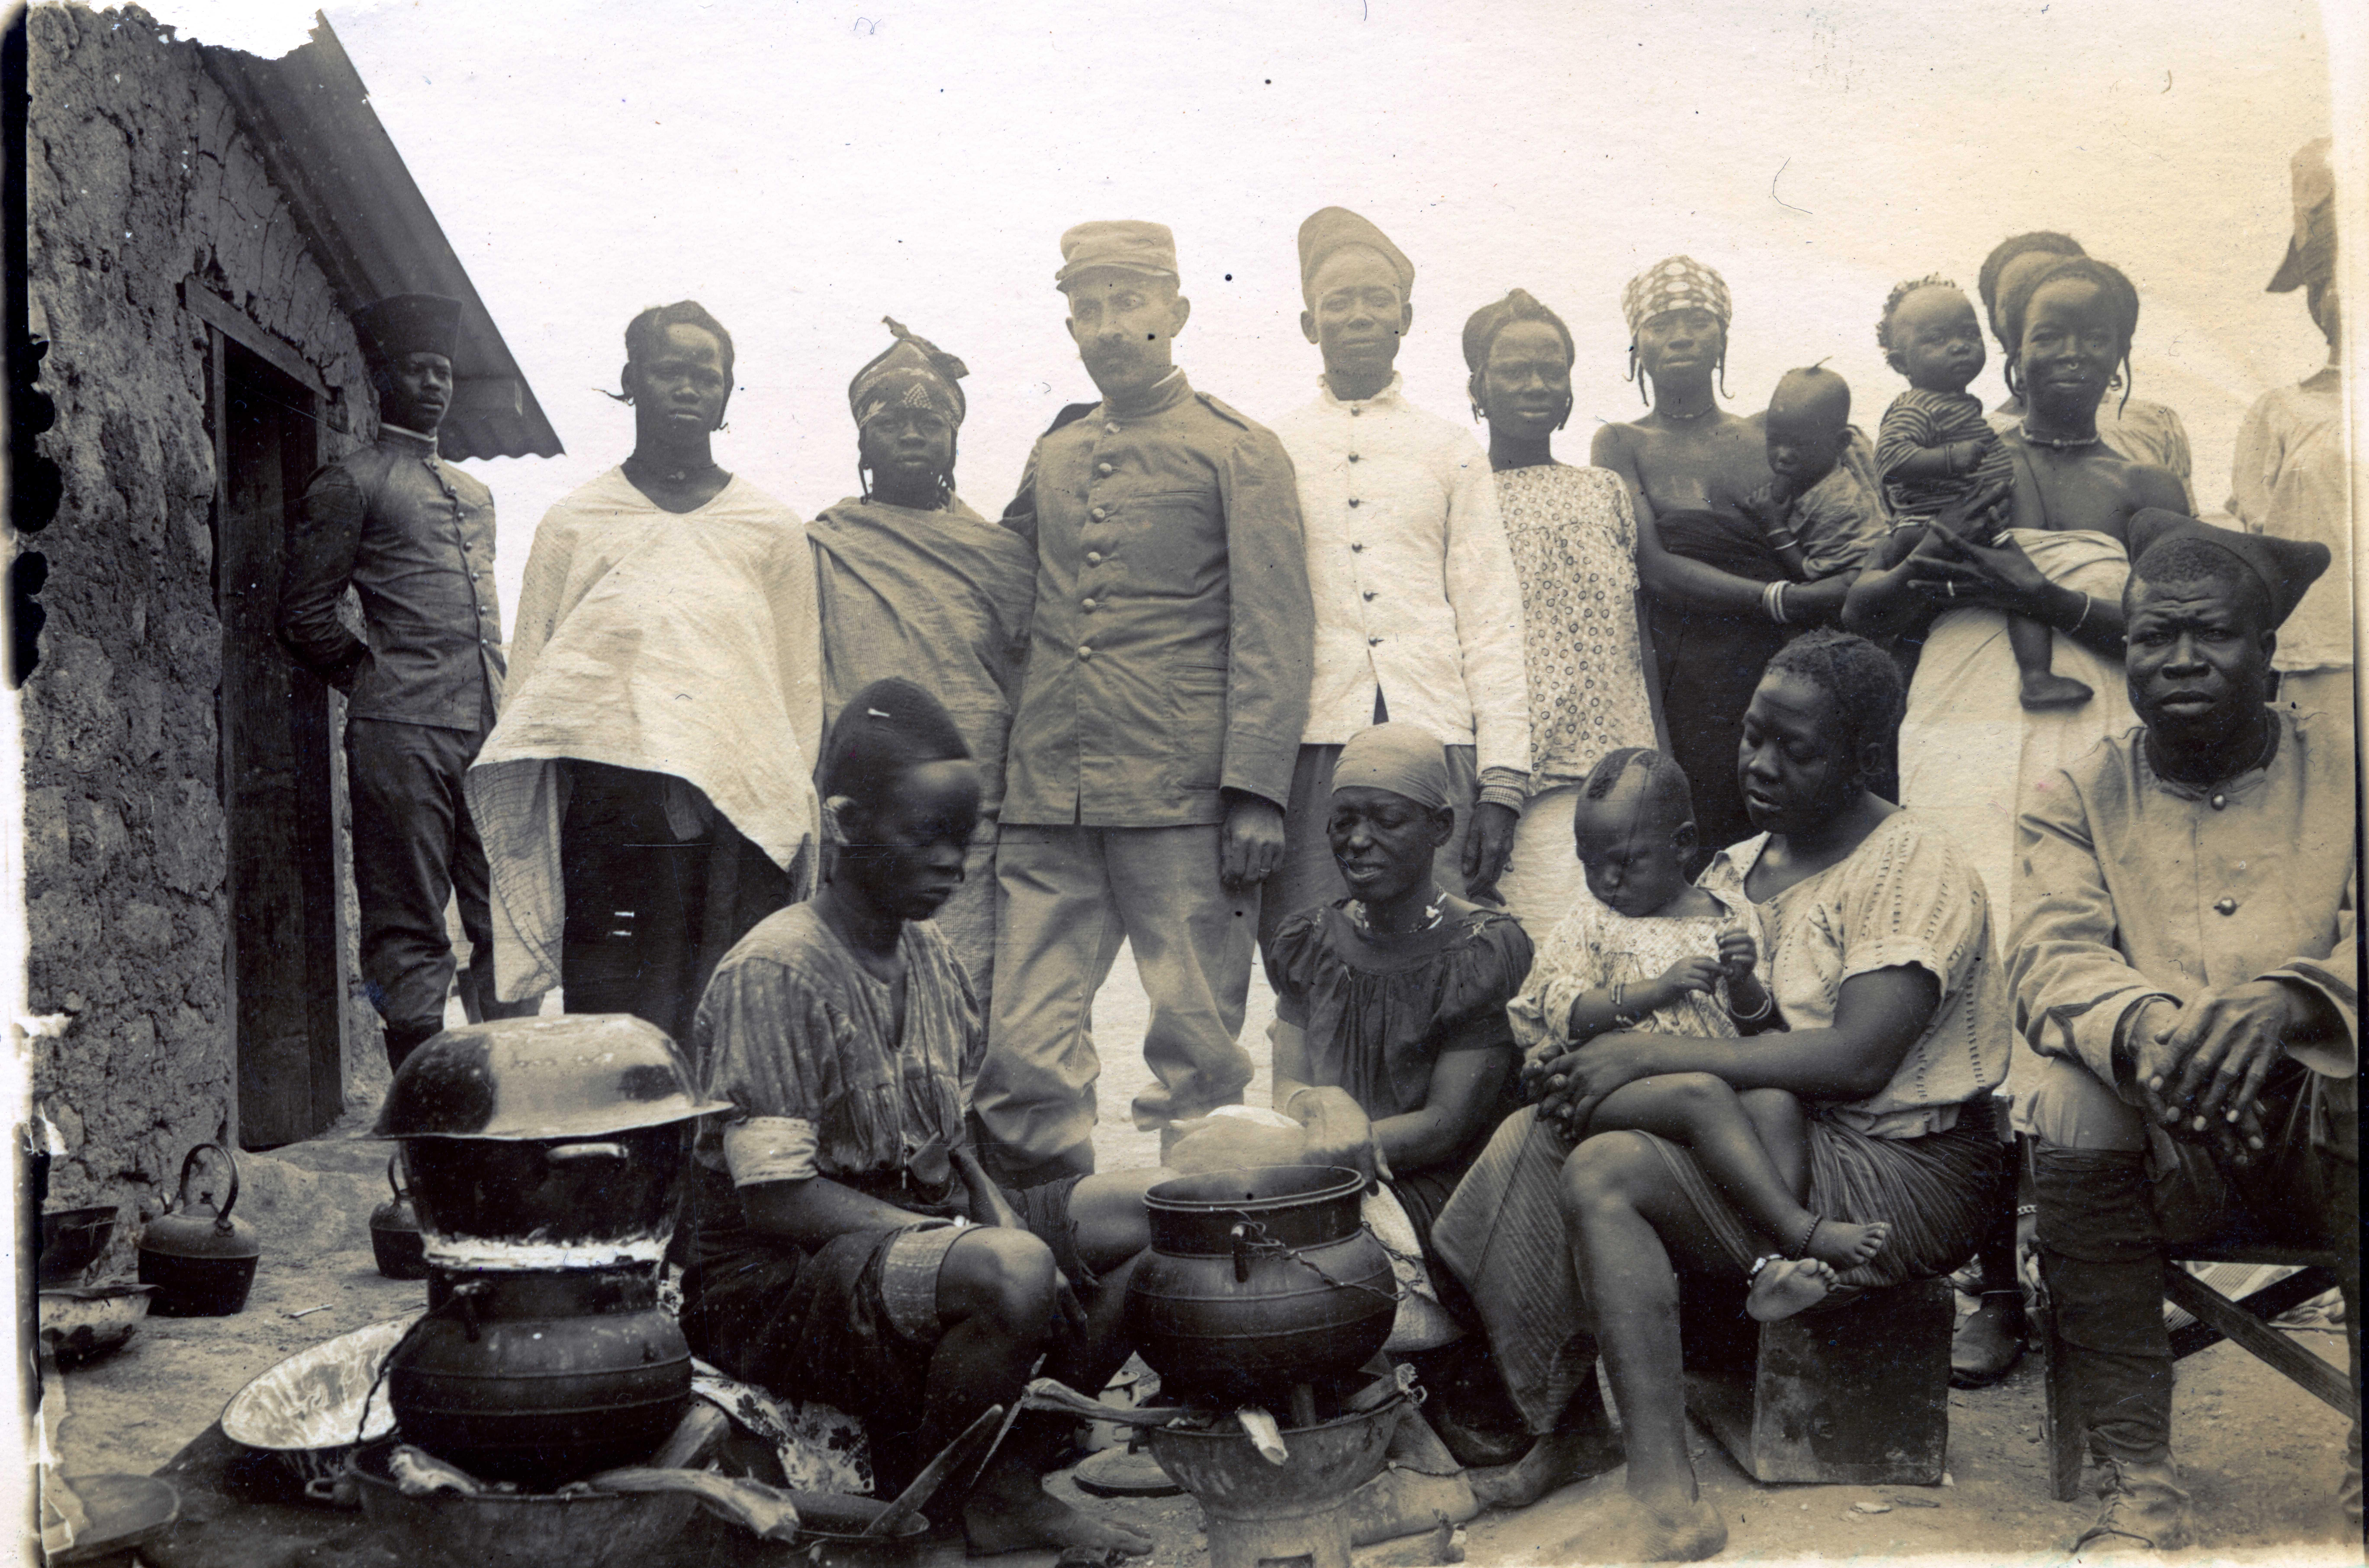 Maroc 1915 - Camp militaire Meknès